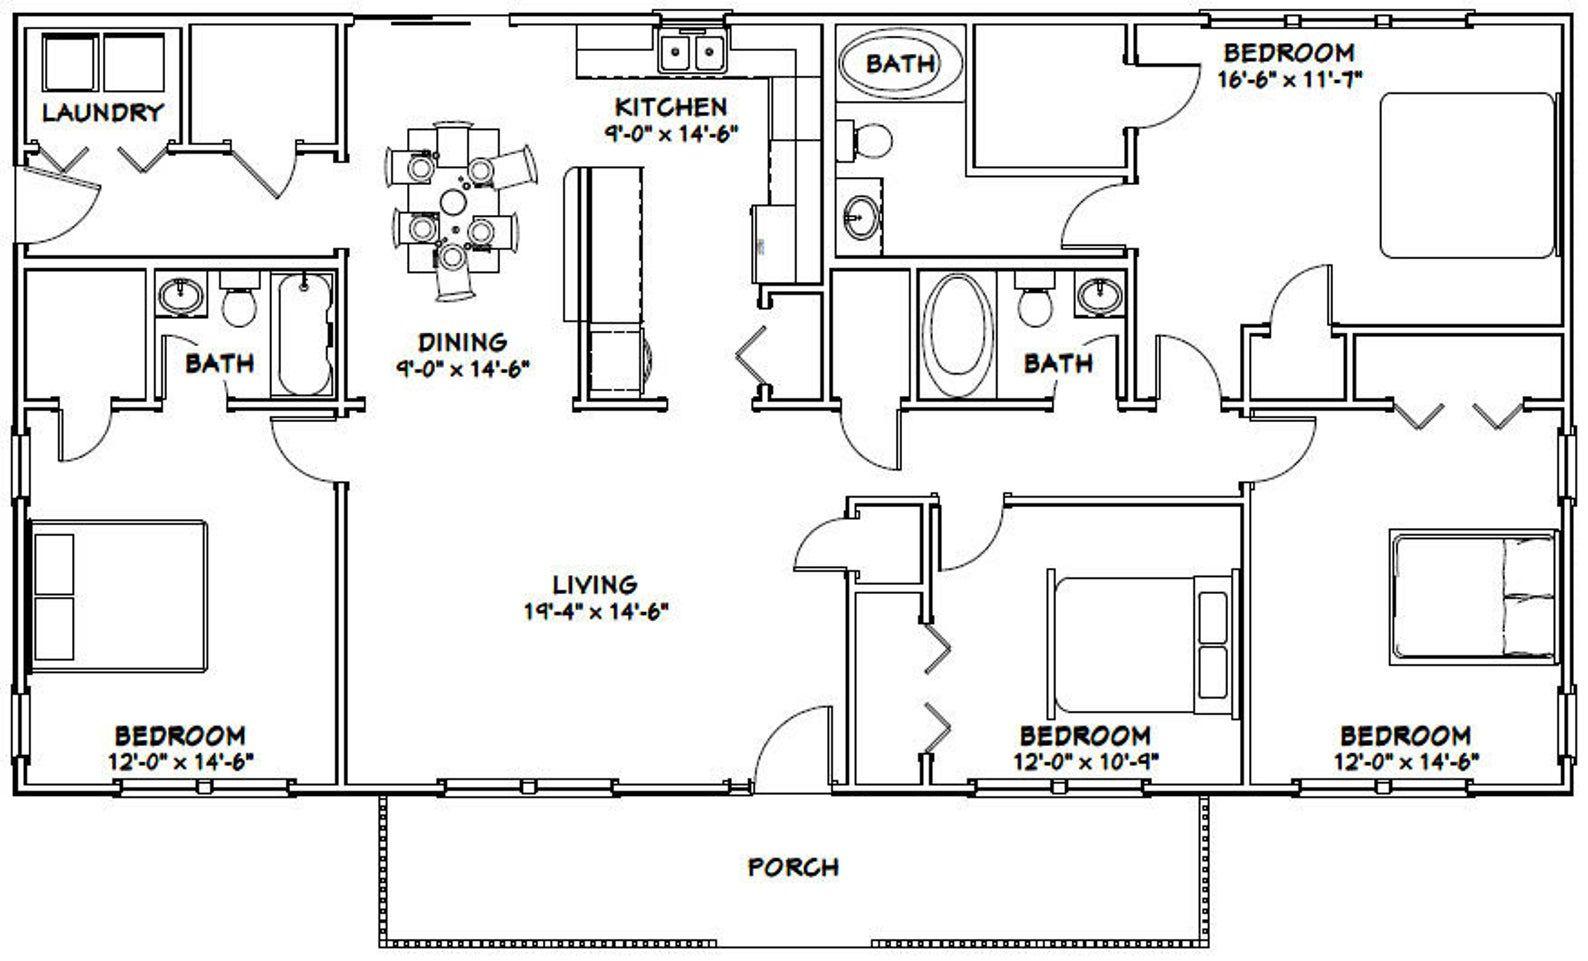 60x30 house 4bedroom 3bath 1800 sq ft pdf floor  etsy